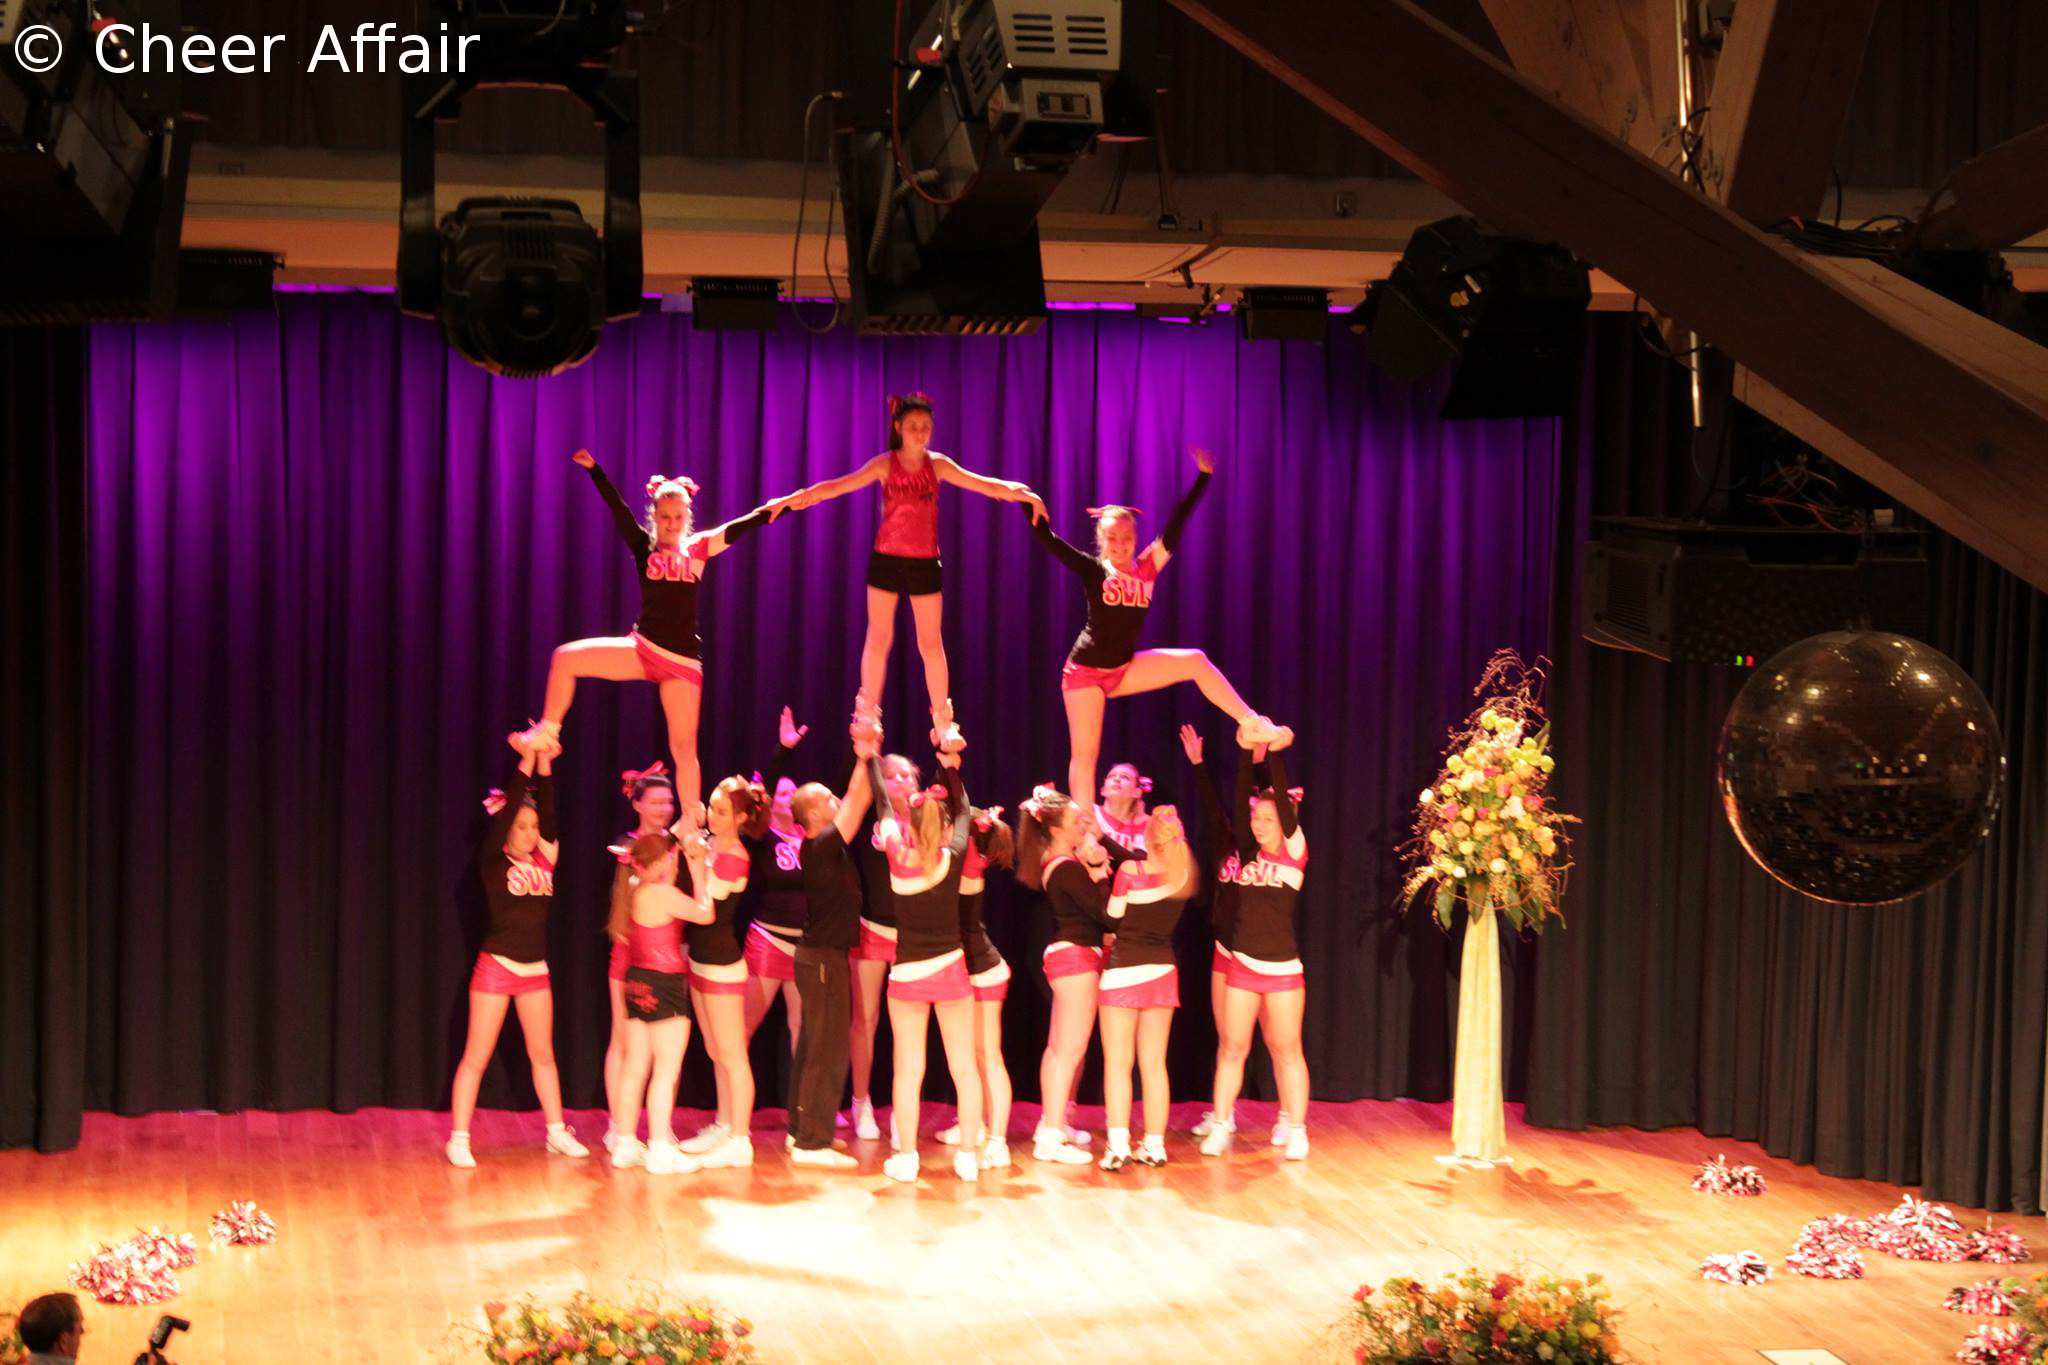 Der Cheer Affair Jahresrückblick 2015